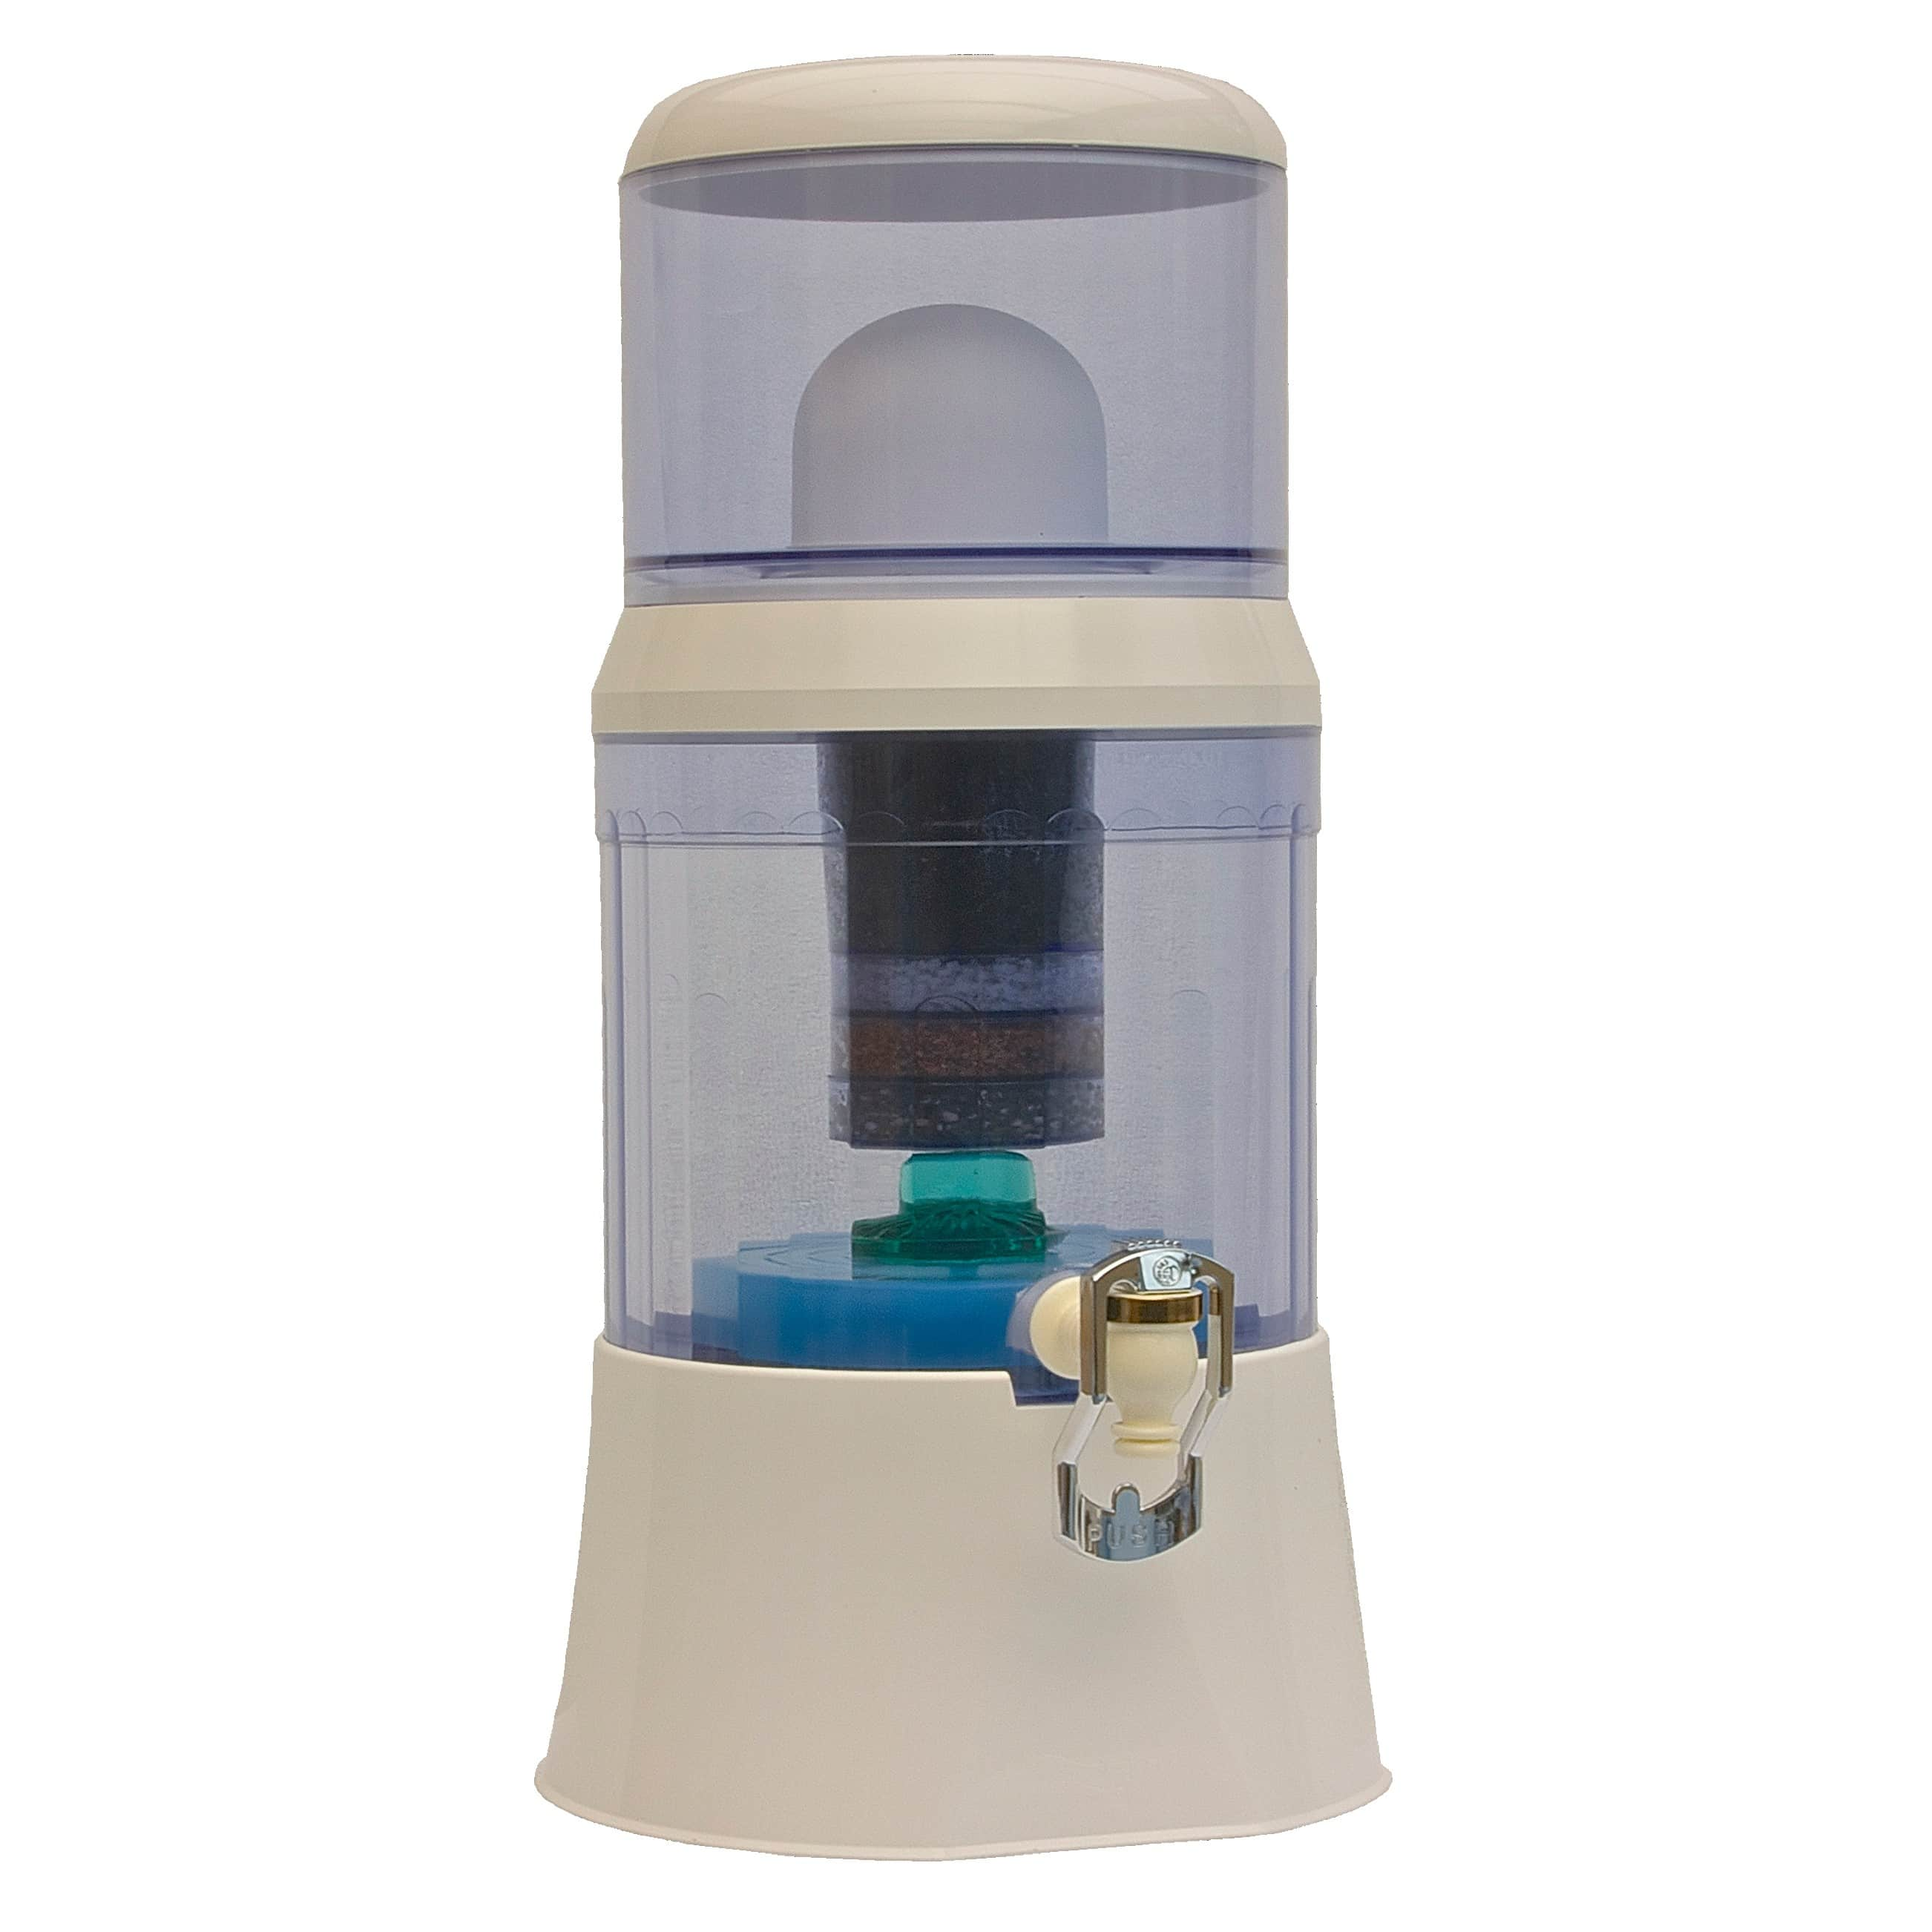 Fontaine filtrante EVA BEP ou PLC en 7, 12 ou 25 litres